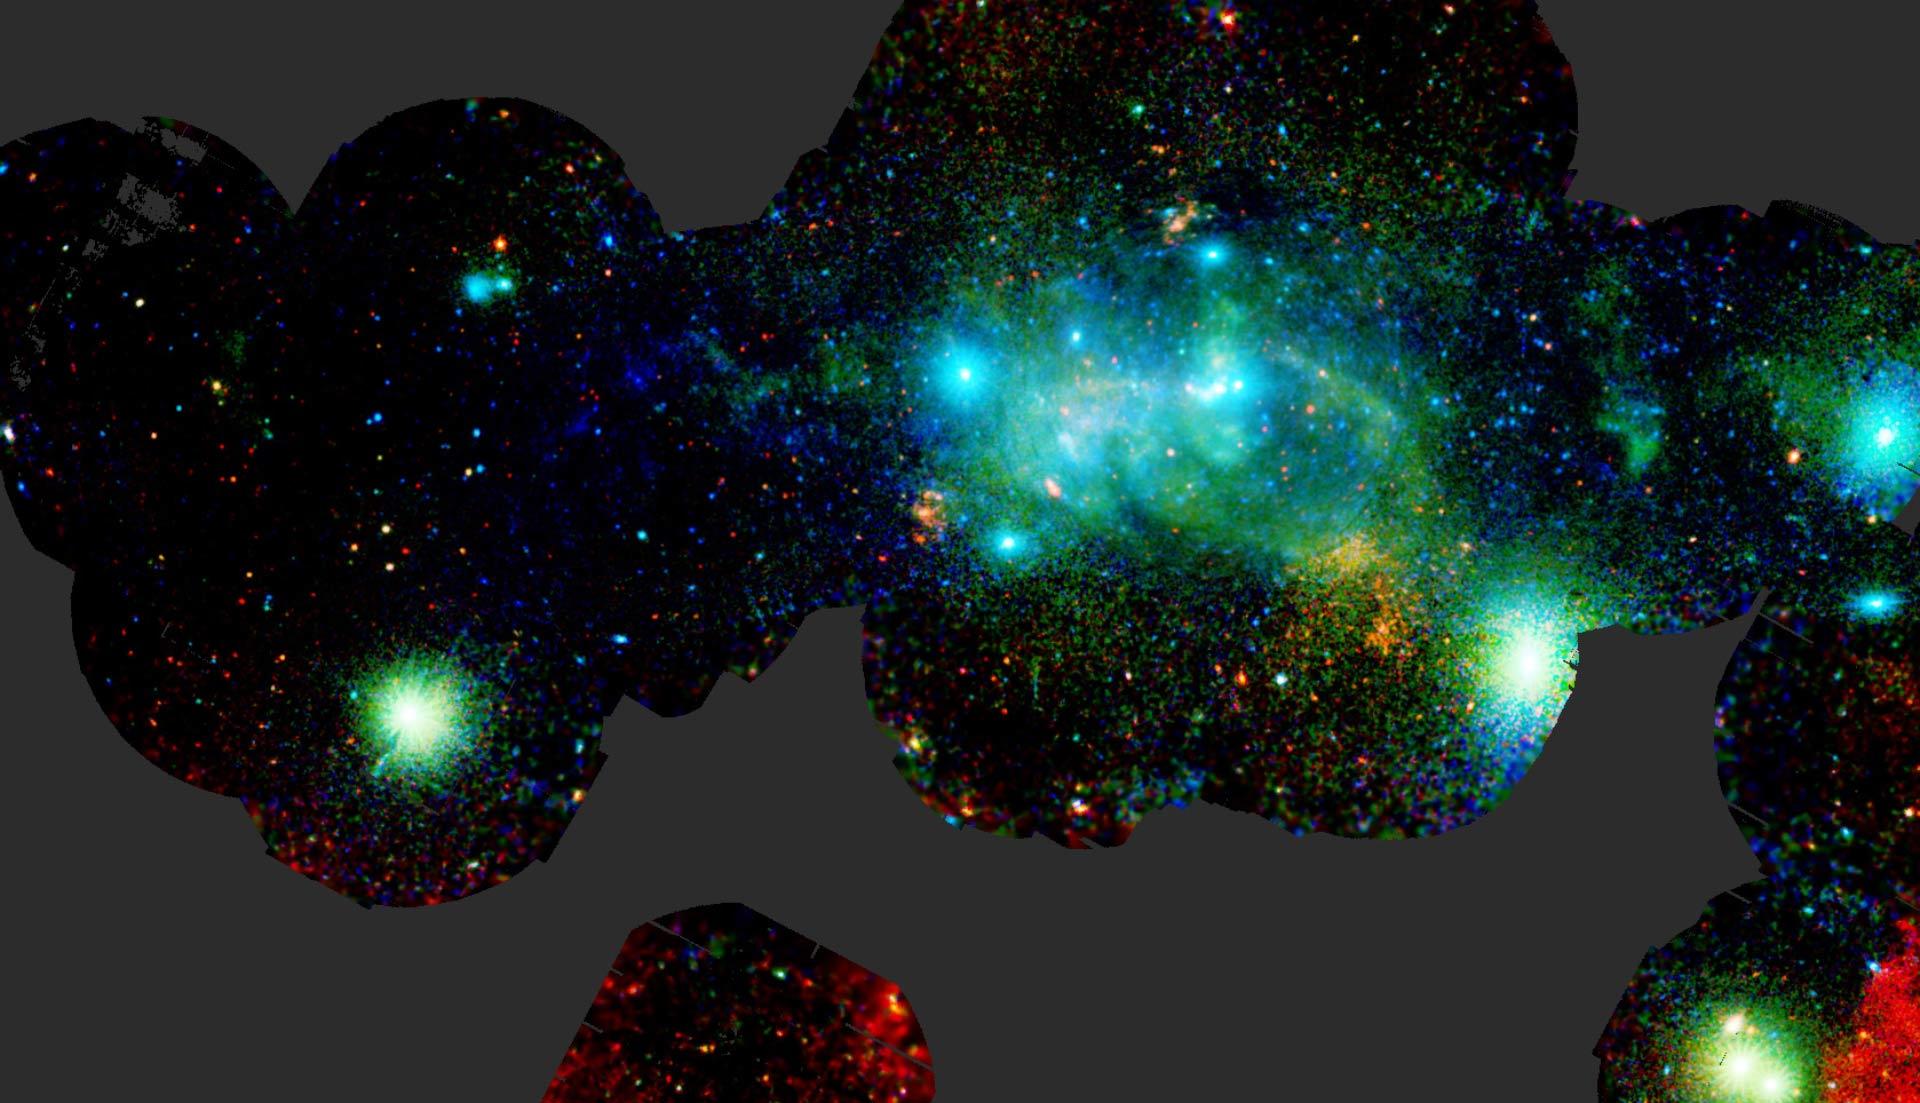 image_3158_1e-Milky-Way-Center